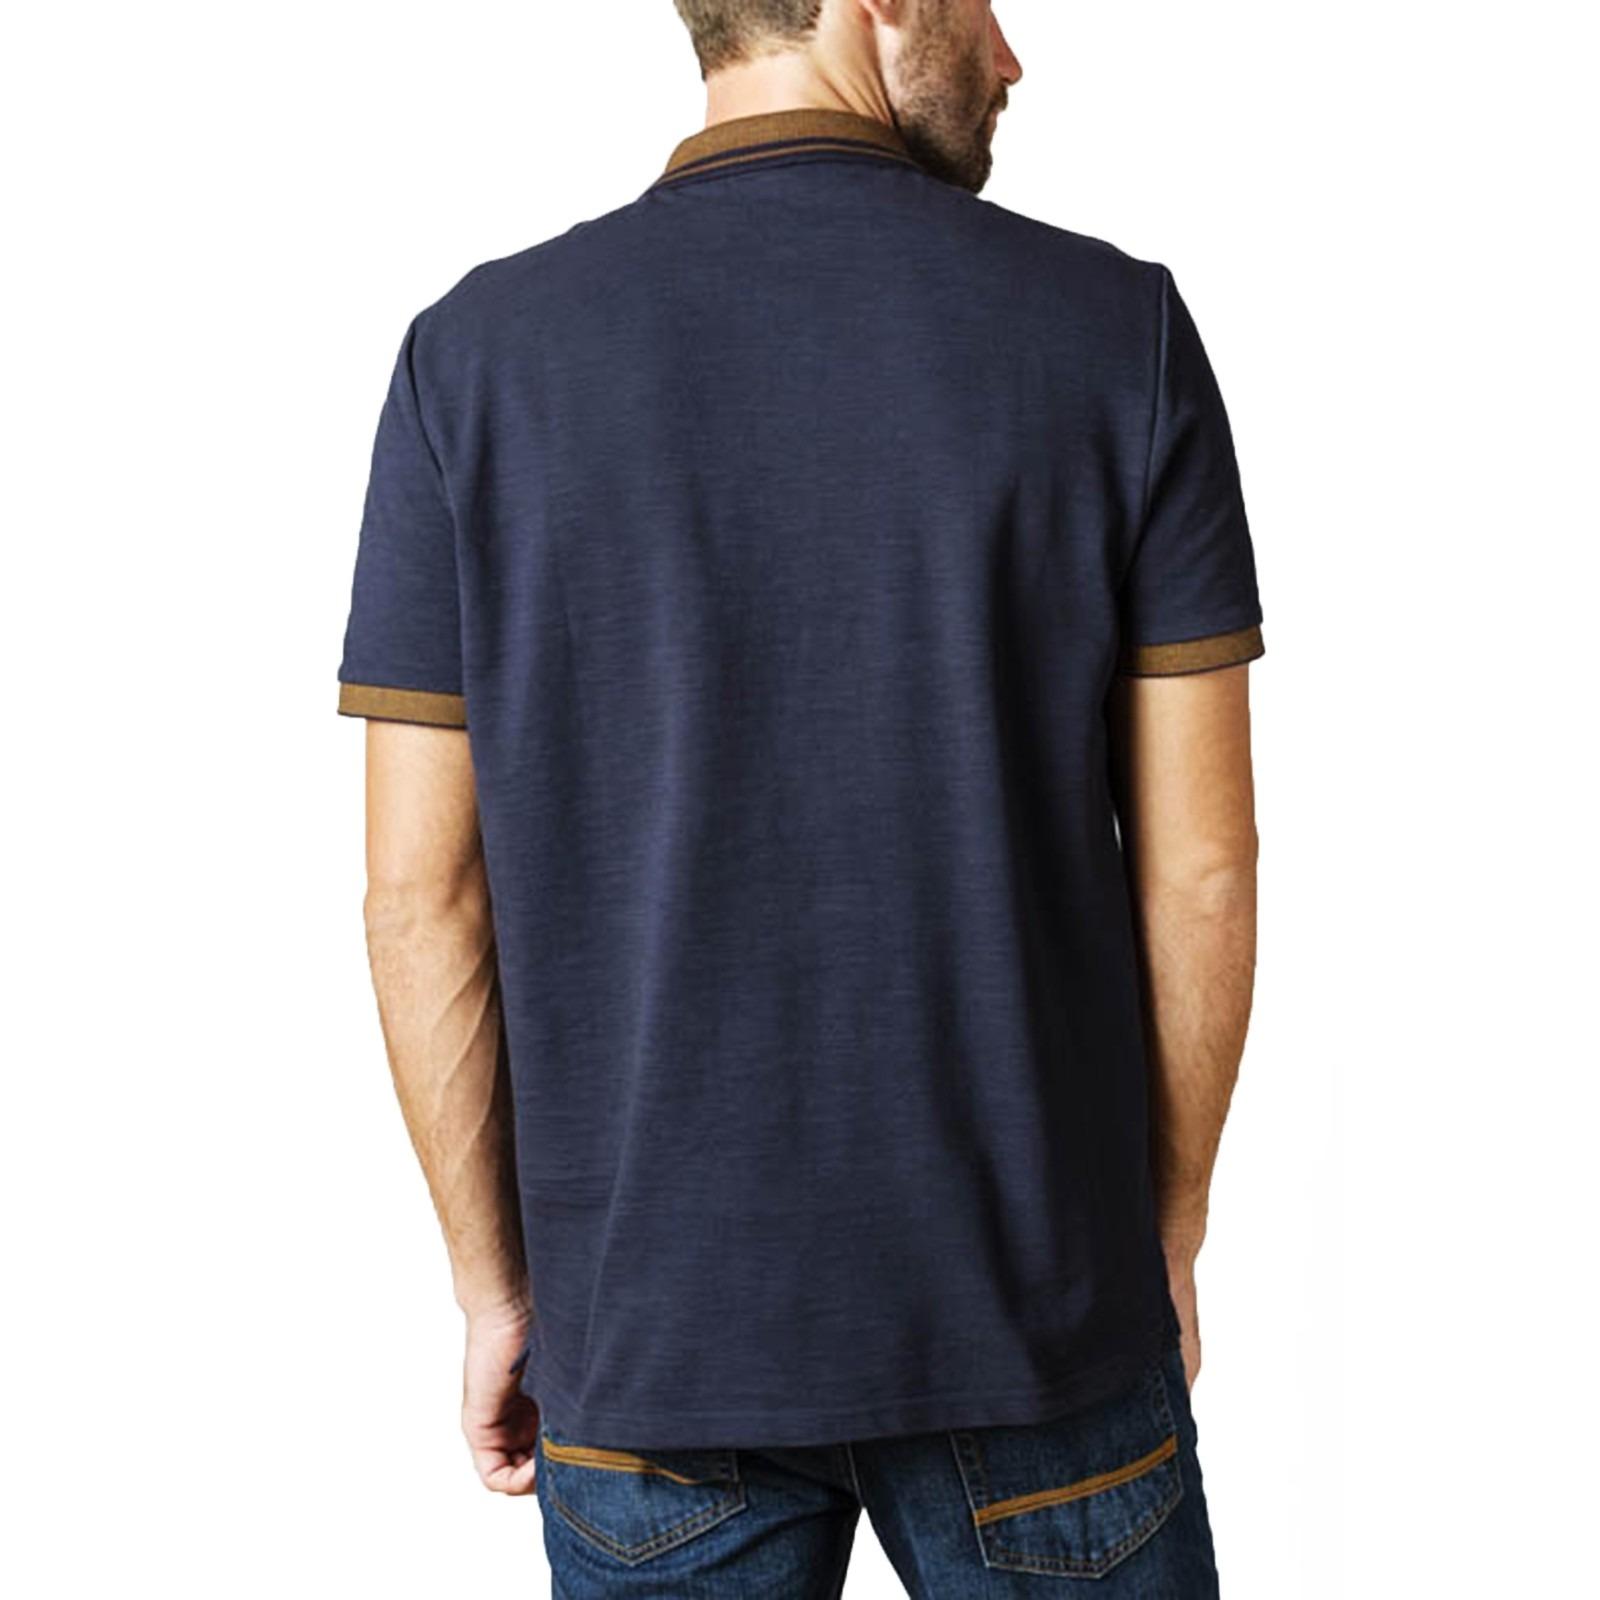 Ben Sherman Birdseye navy blue polo shirt